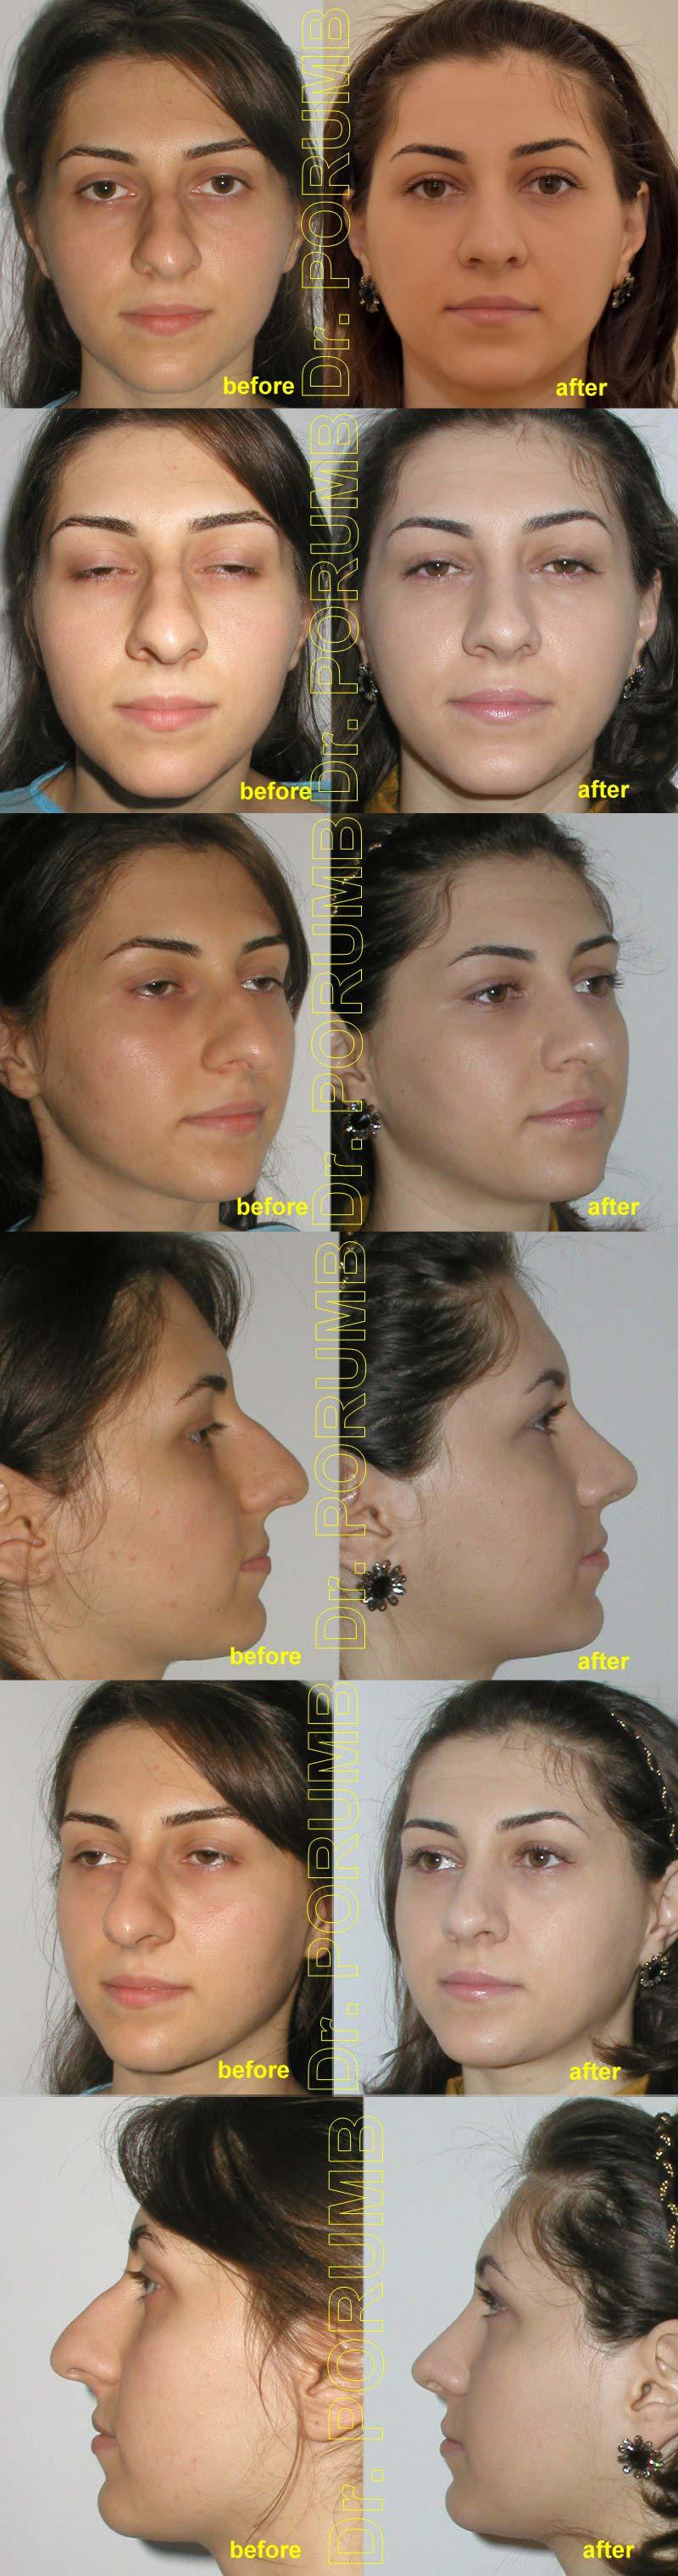 Pacienta de 22 ani, nemultumita de deviatia si marimea nasului, de deviatia de s